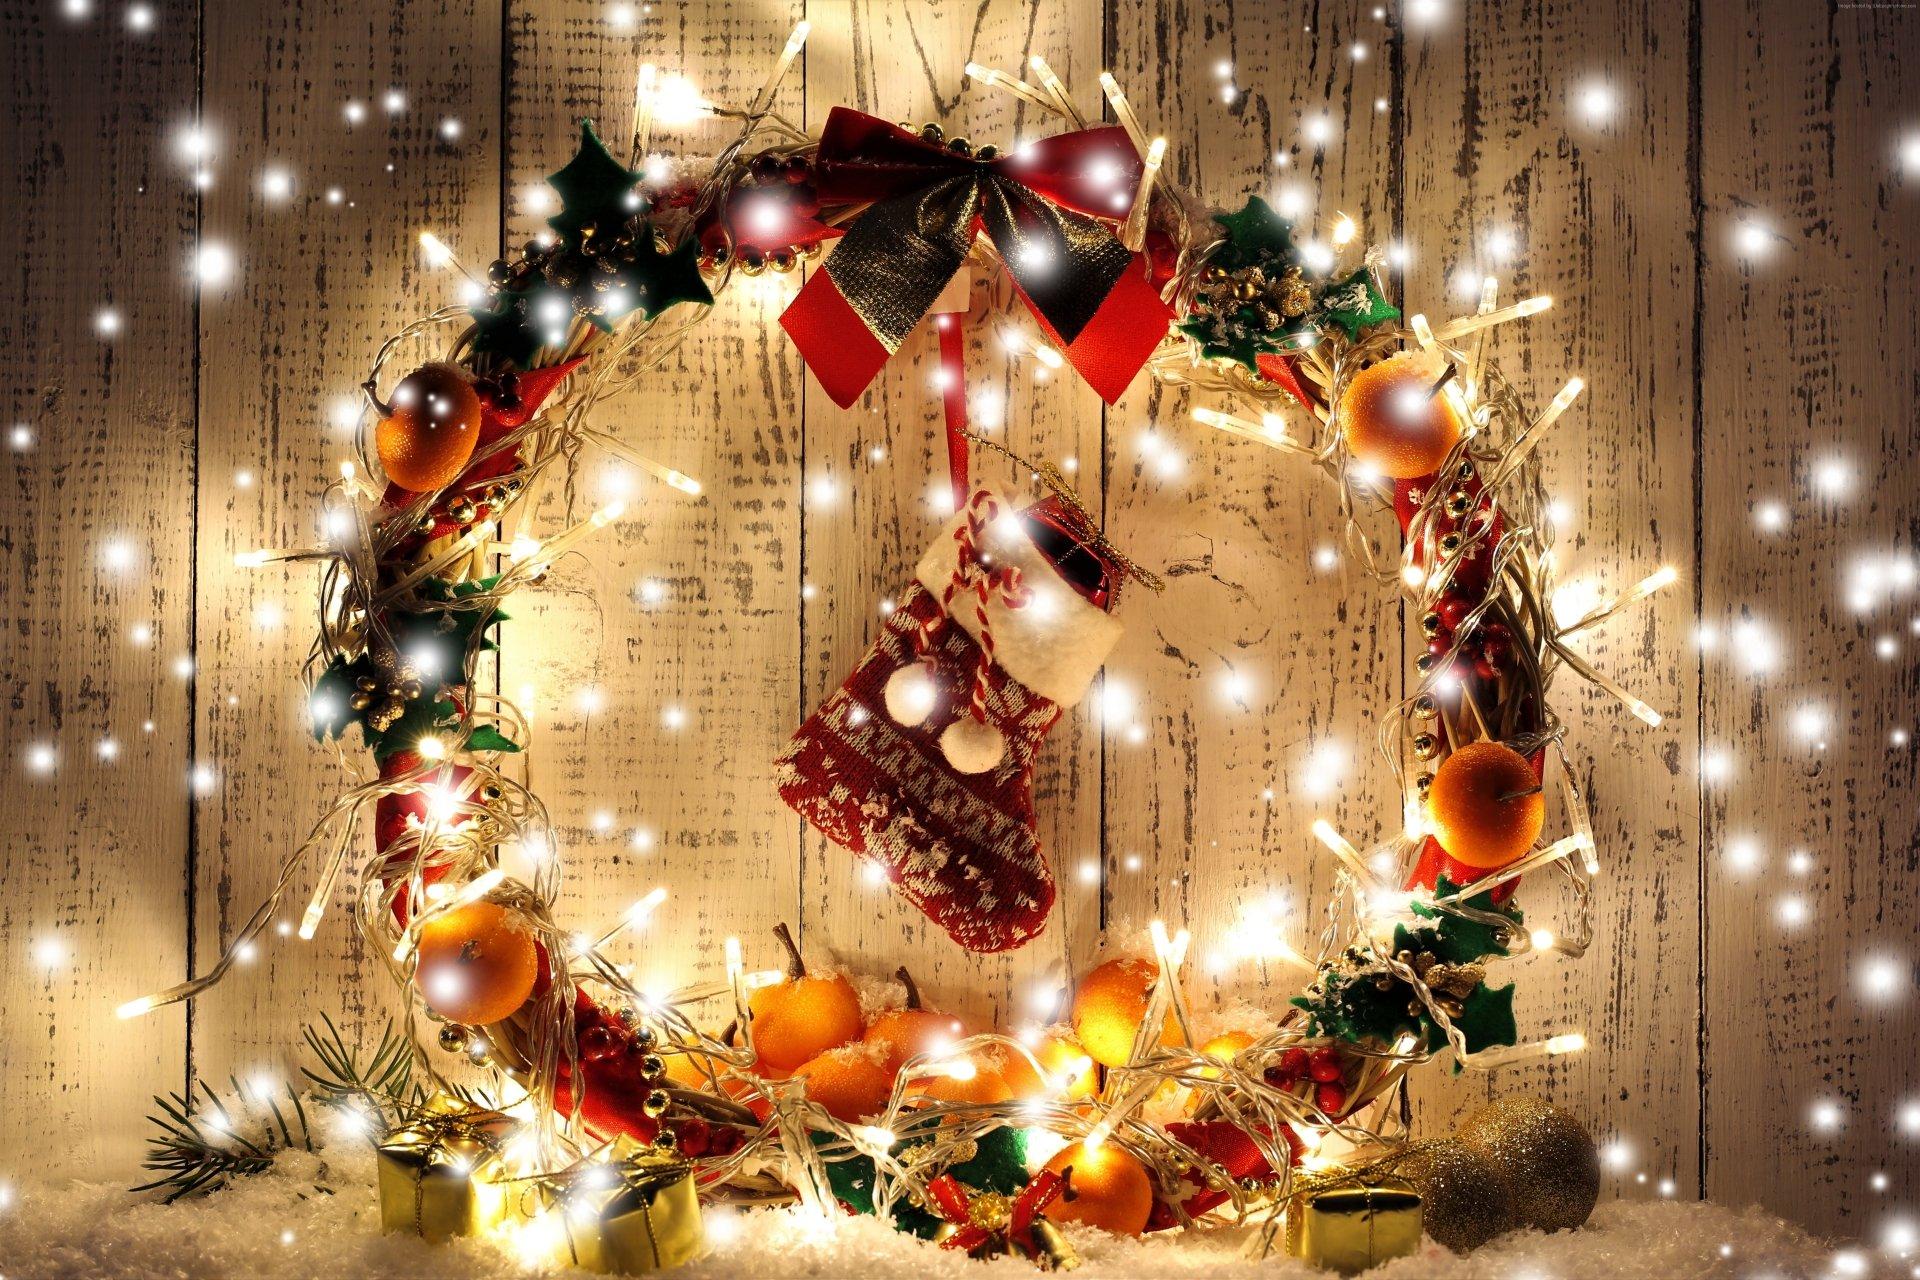 Holiday - Christmas  Holiday Wreath Light Apricot Stocking Wallpaper